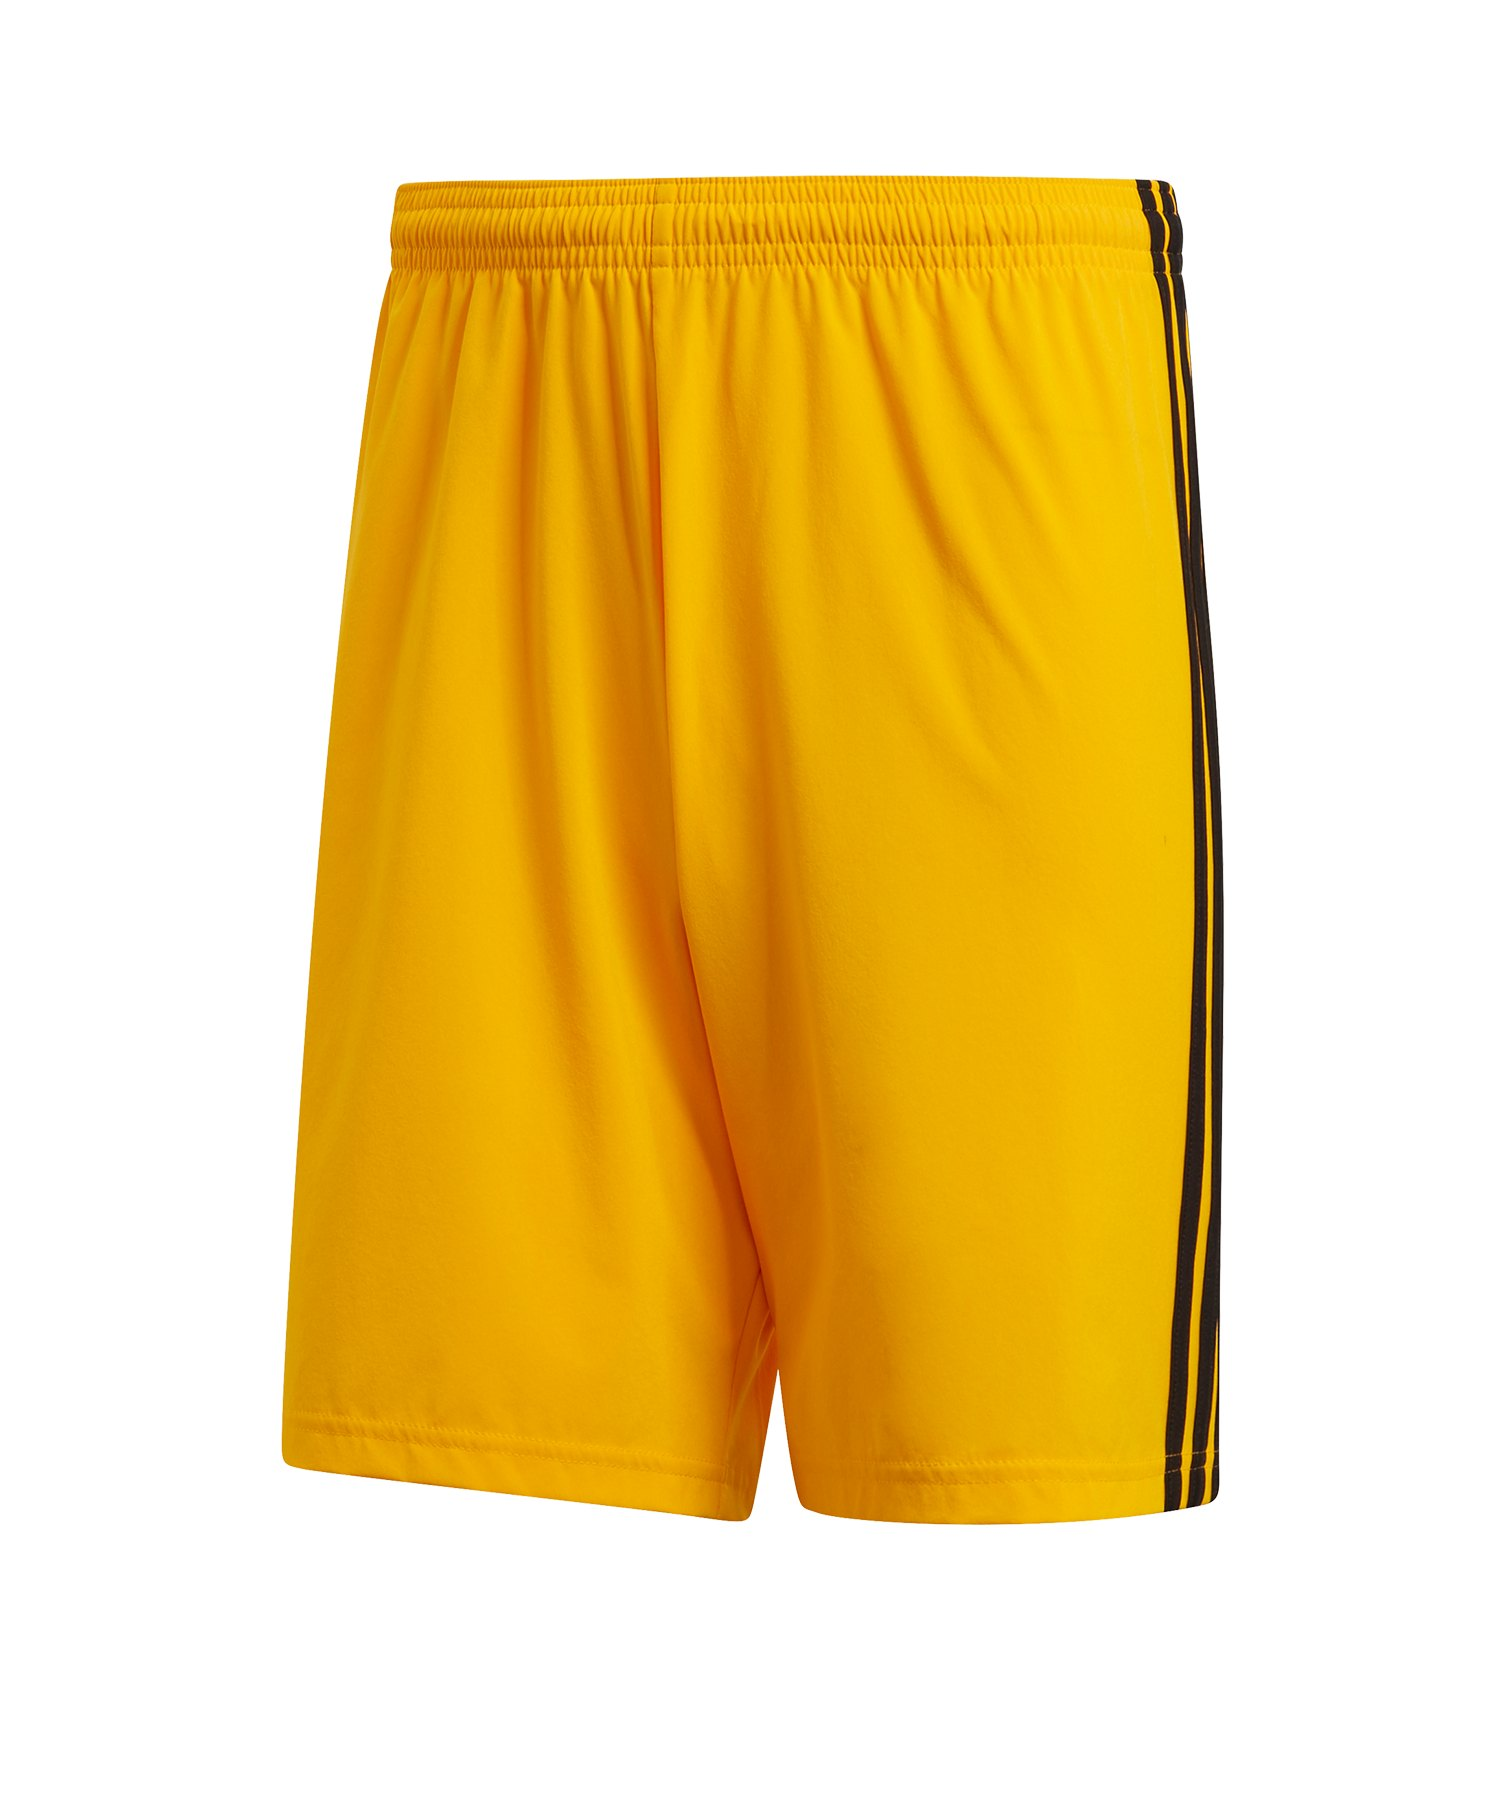 adidas Condivo 18 Short Hose kurz Gold Schwarz